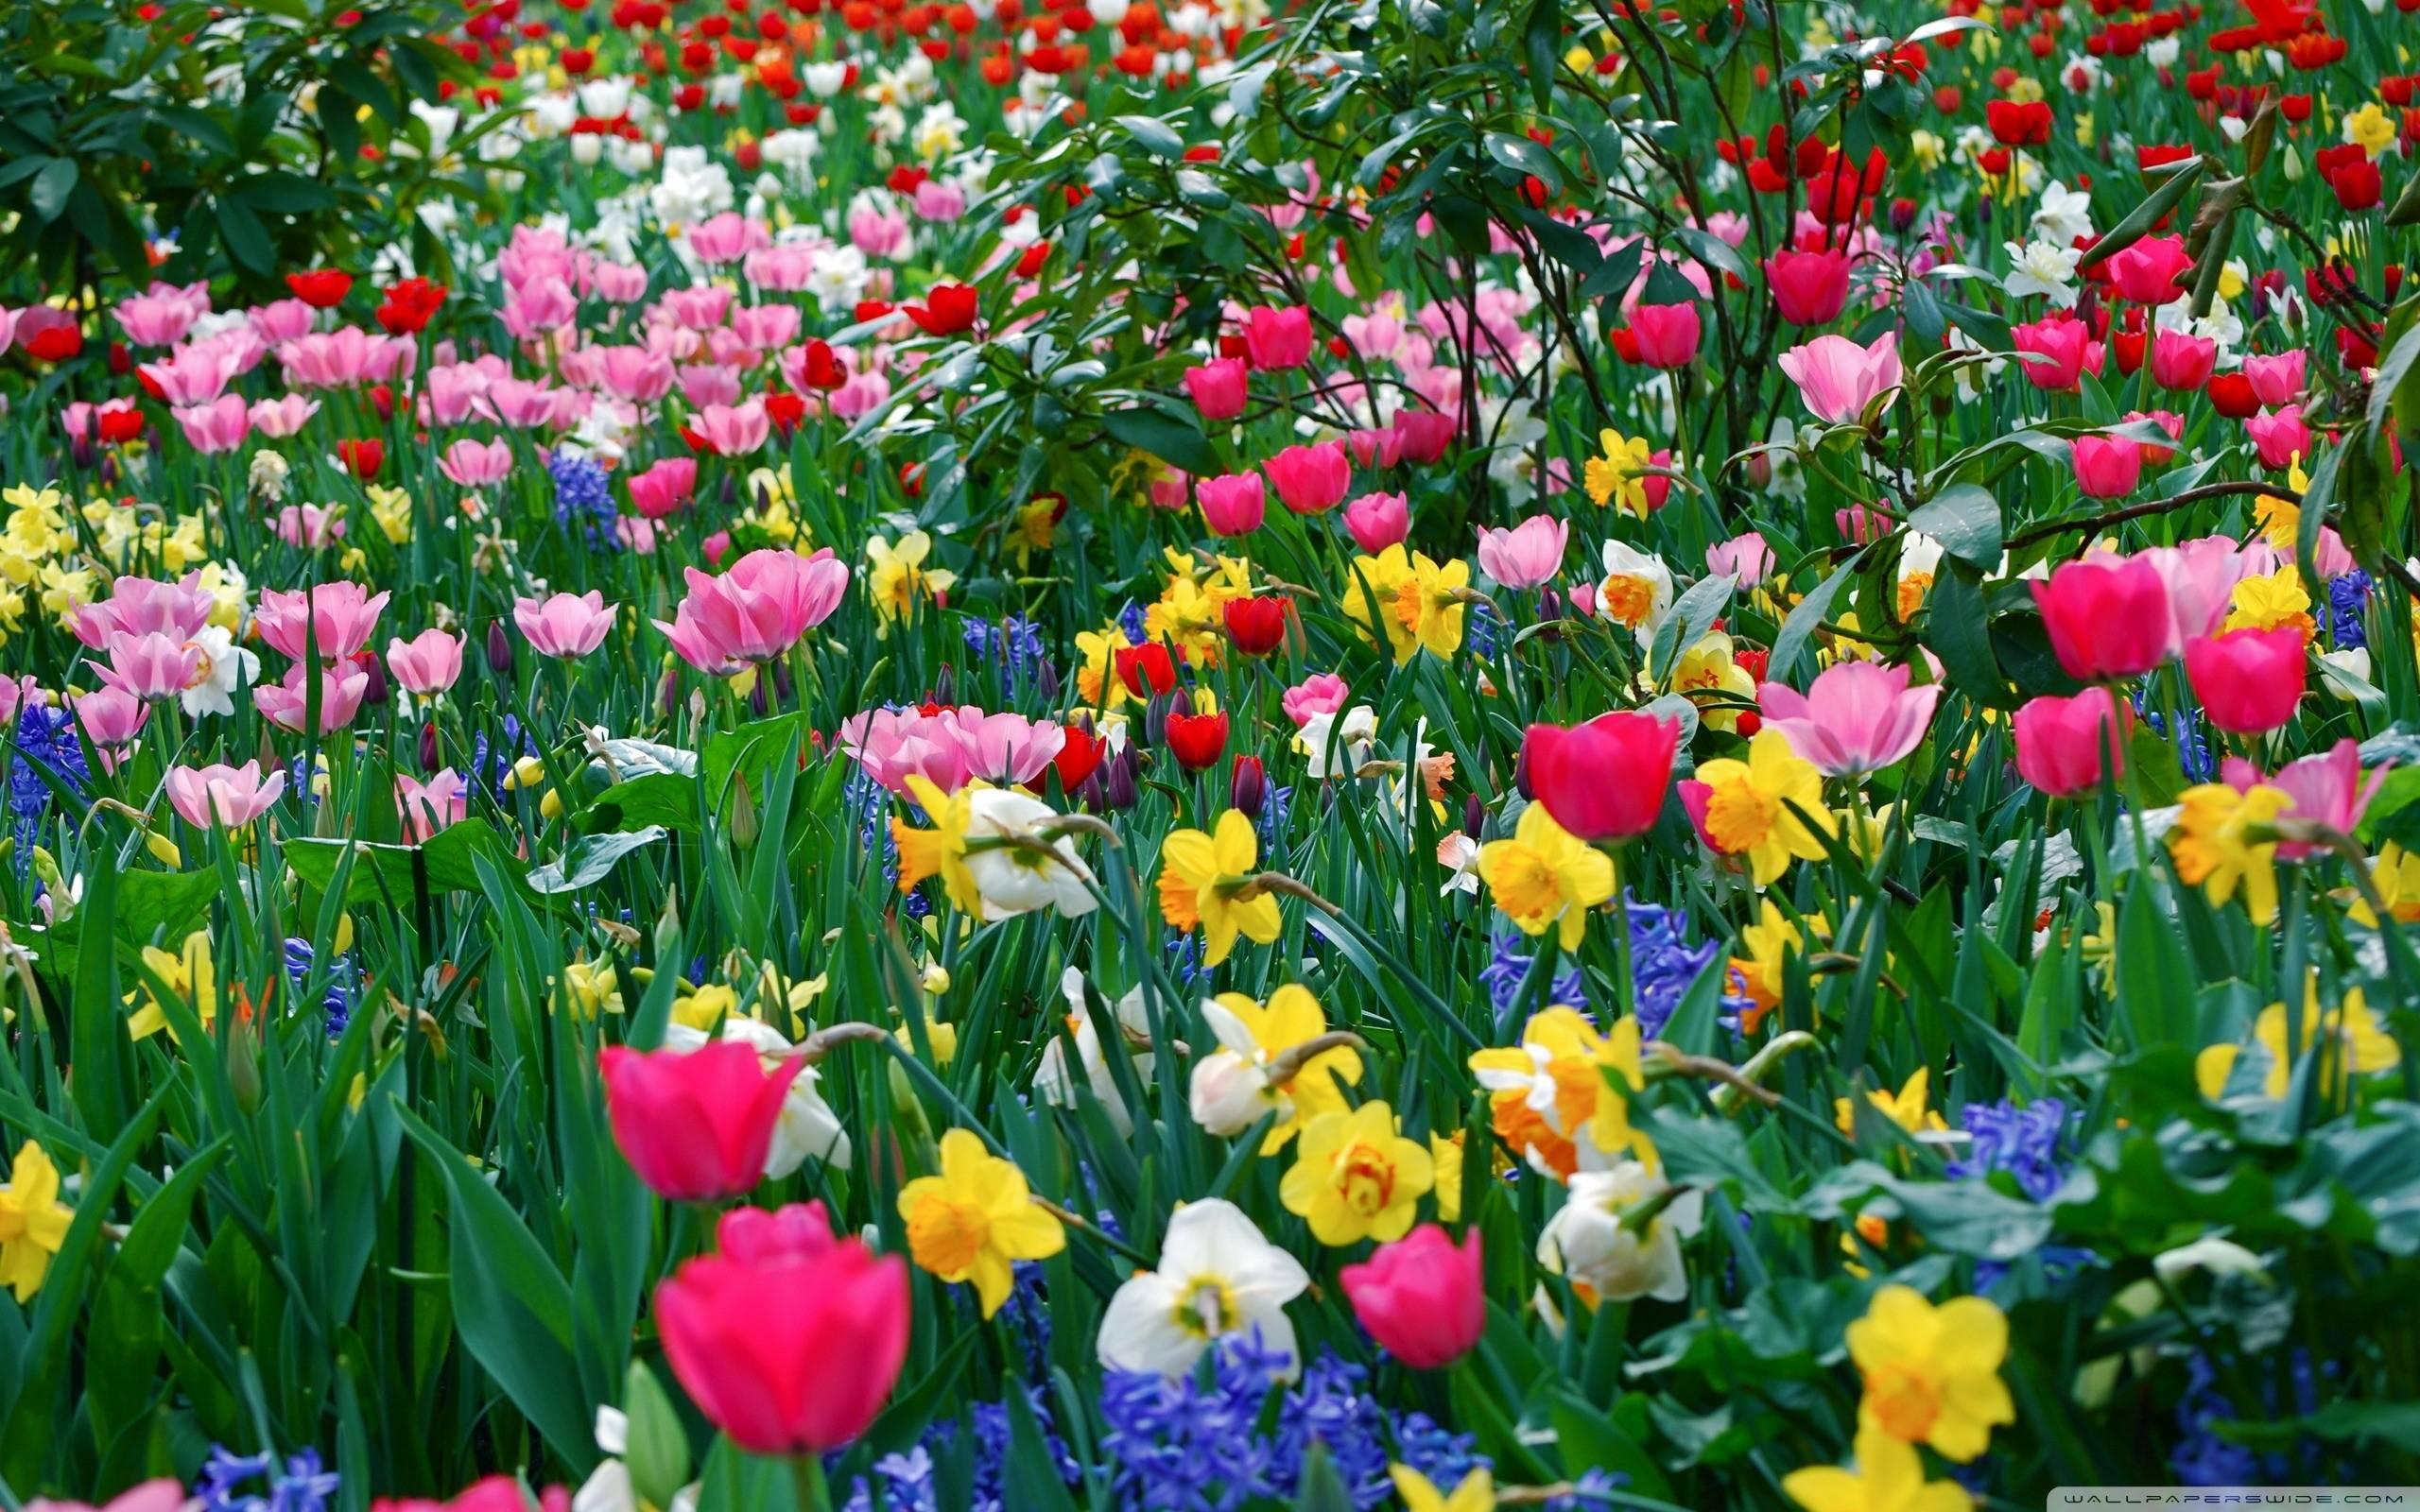 Spring Flowers Wallpaper Phone Download SubWallpaper 2560x1600